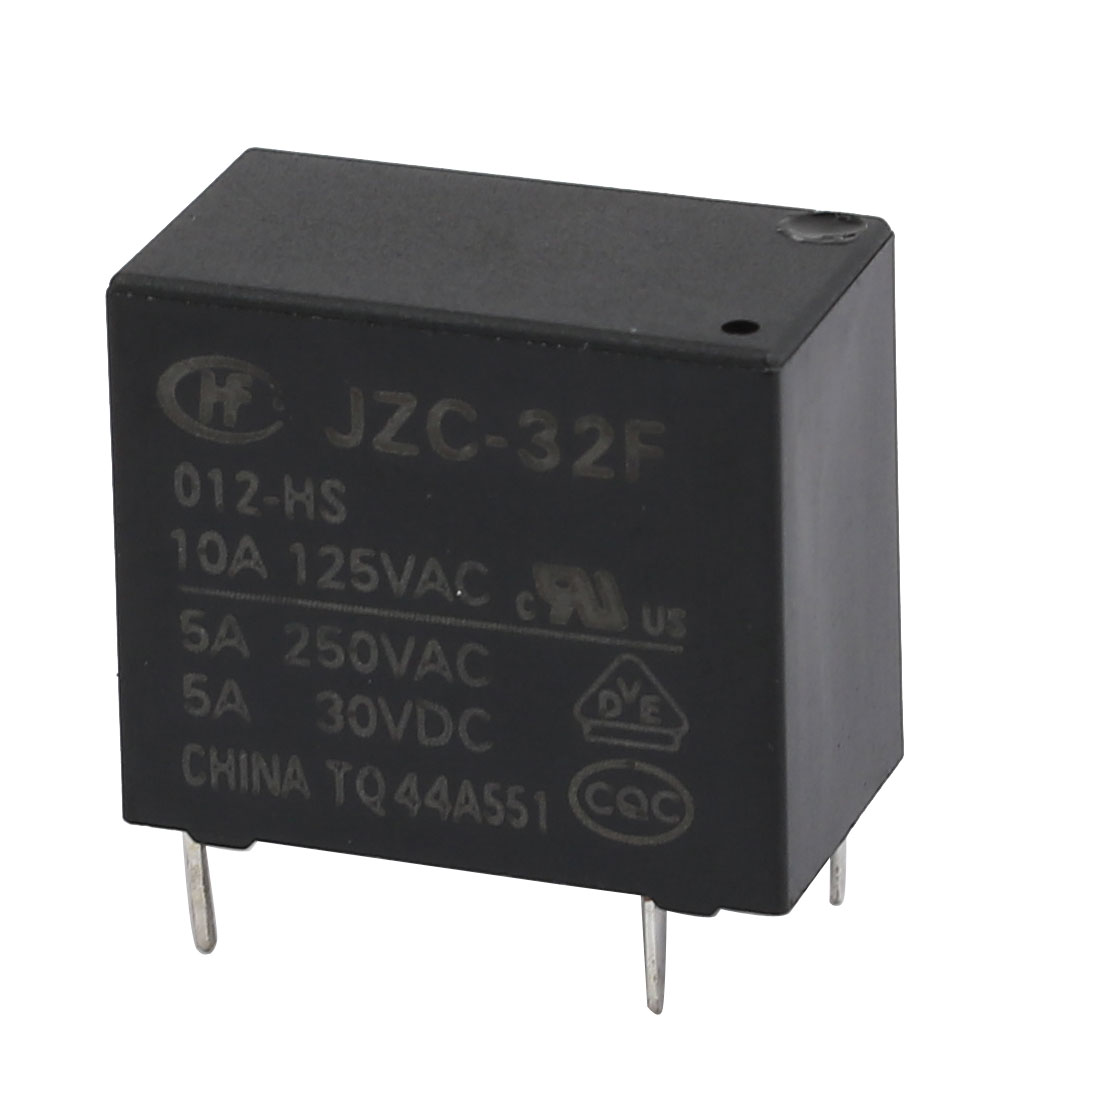 DC 30V 4P Power Electromagnetic Relay DIN Rail/PCB Mounted AC 250V 5A/125V 10A